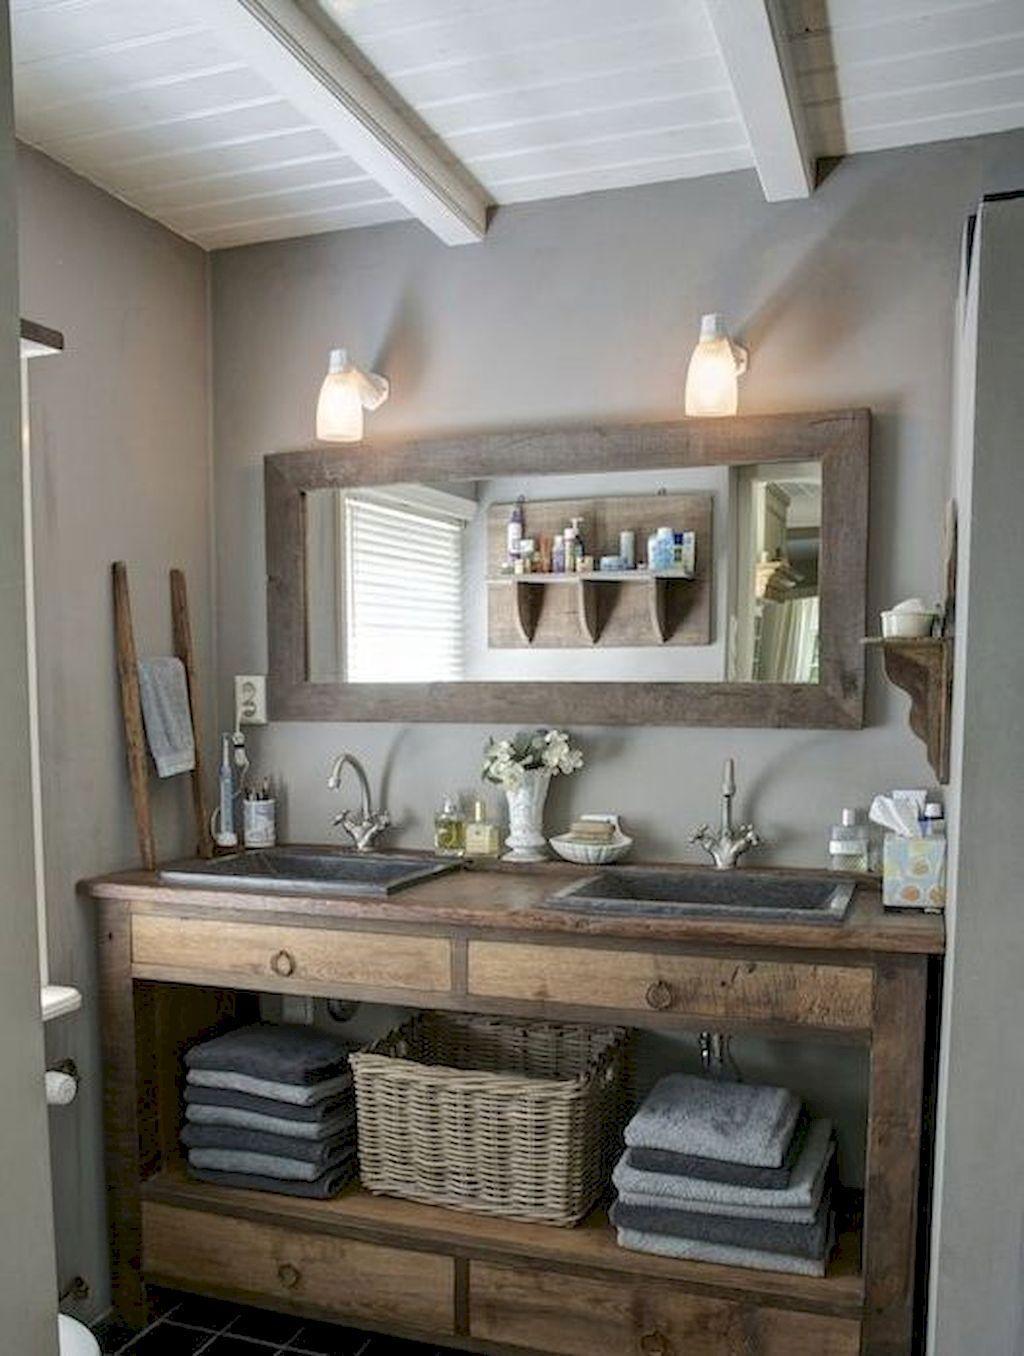 125 Brilliant Farmhouse Bathroom Vanity Remodel Ideas 83 Homeimprovementideasbathroom Rustic Bathroom Remodel Farmhouse Bathroom Decor Bathroom Vanity Decor